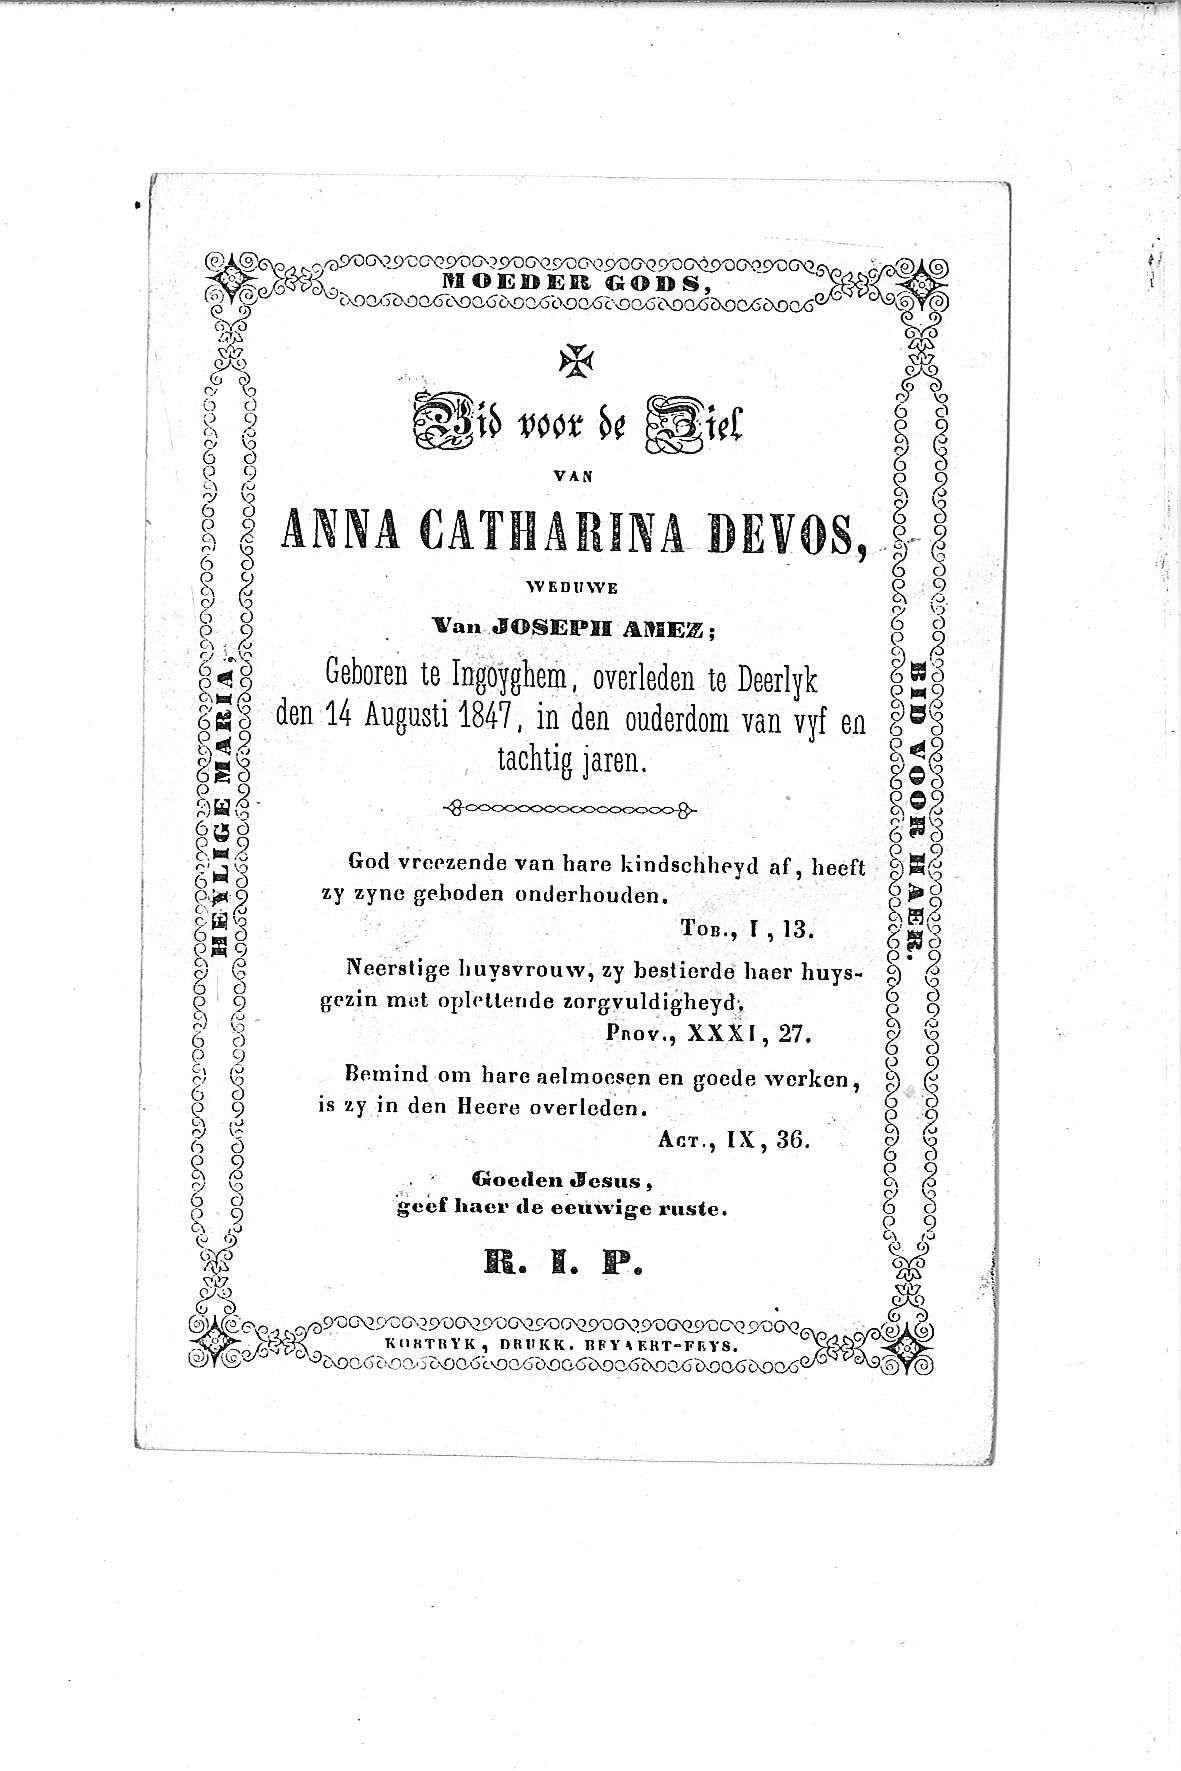 Anna Catharina (1847) 20120229094155_00009.jpg